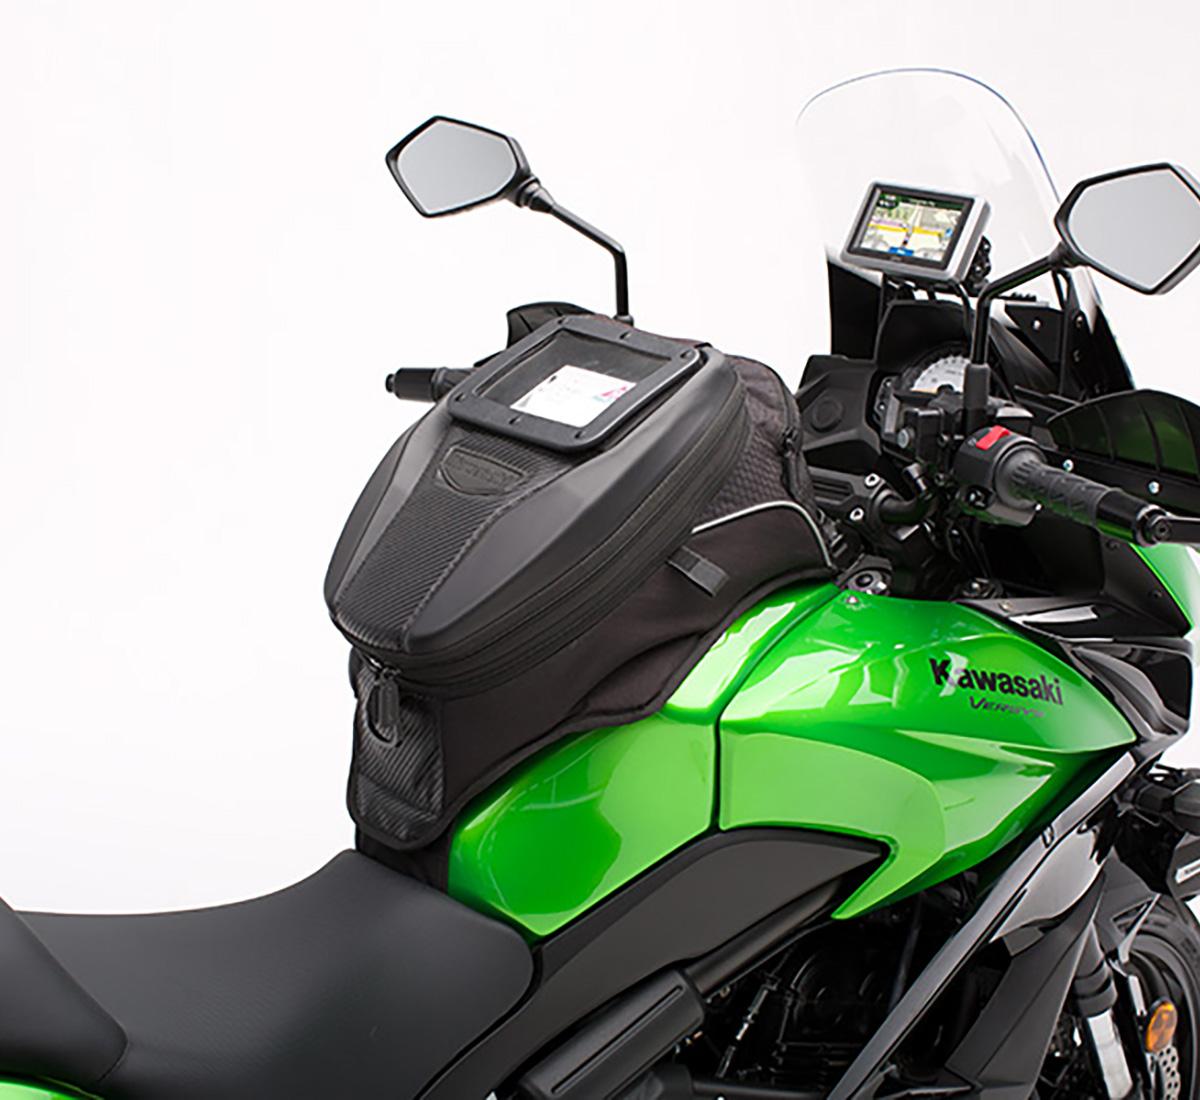 Kawasaki Versys Side Cases